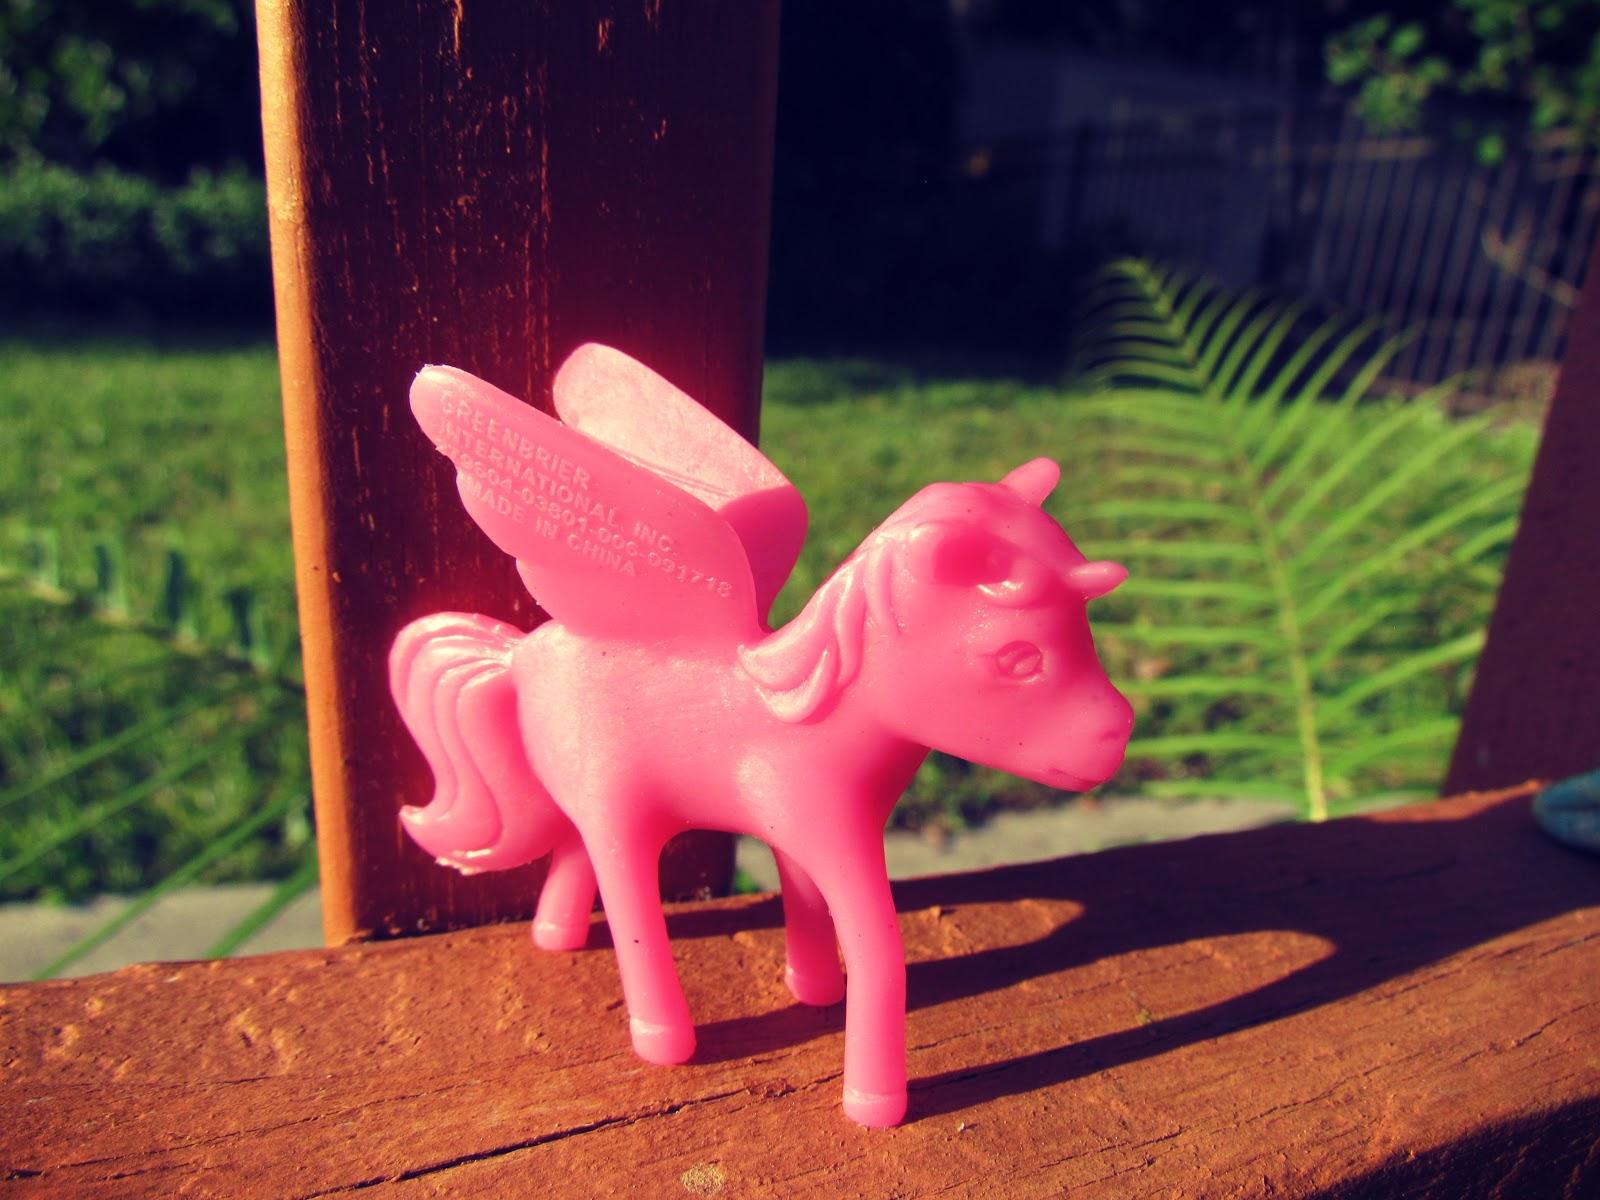 Pink Unicorn Pegasus My Little Pony Plastic Toy + Girls Novelty Gifts